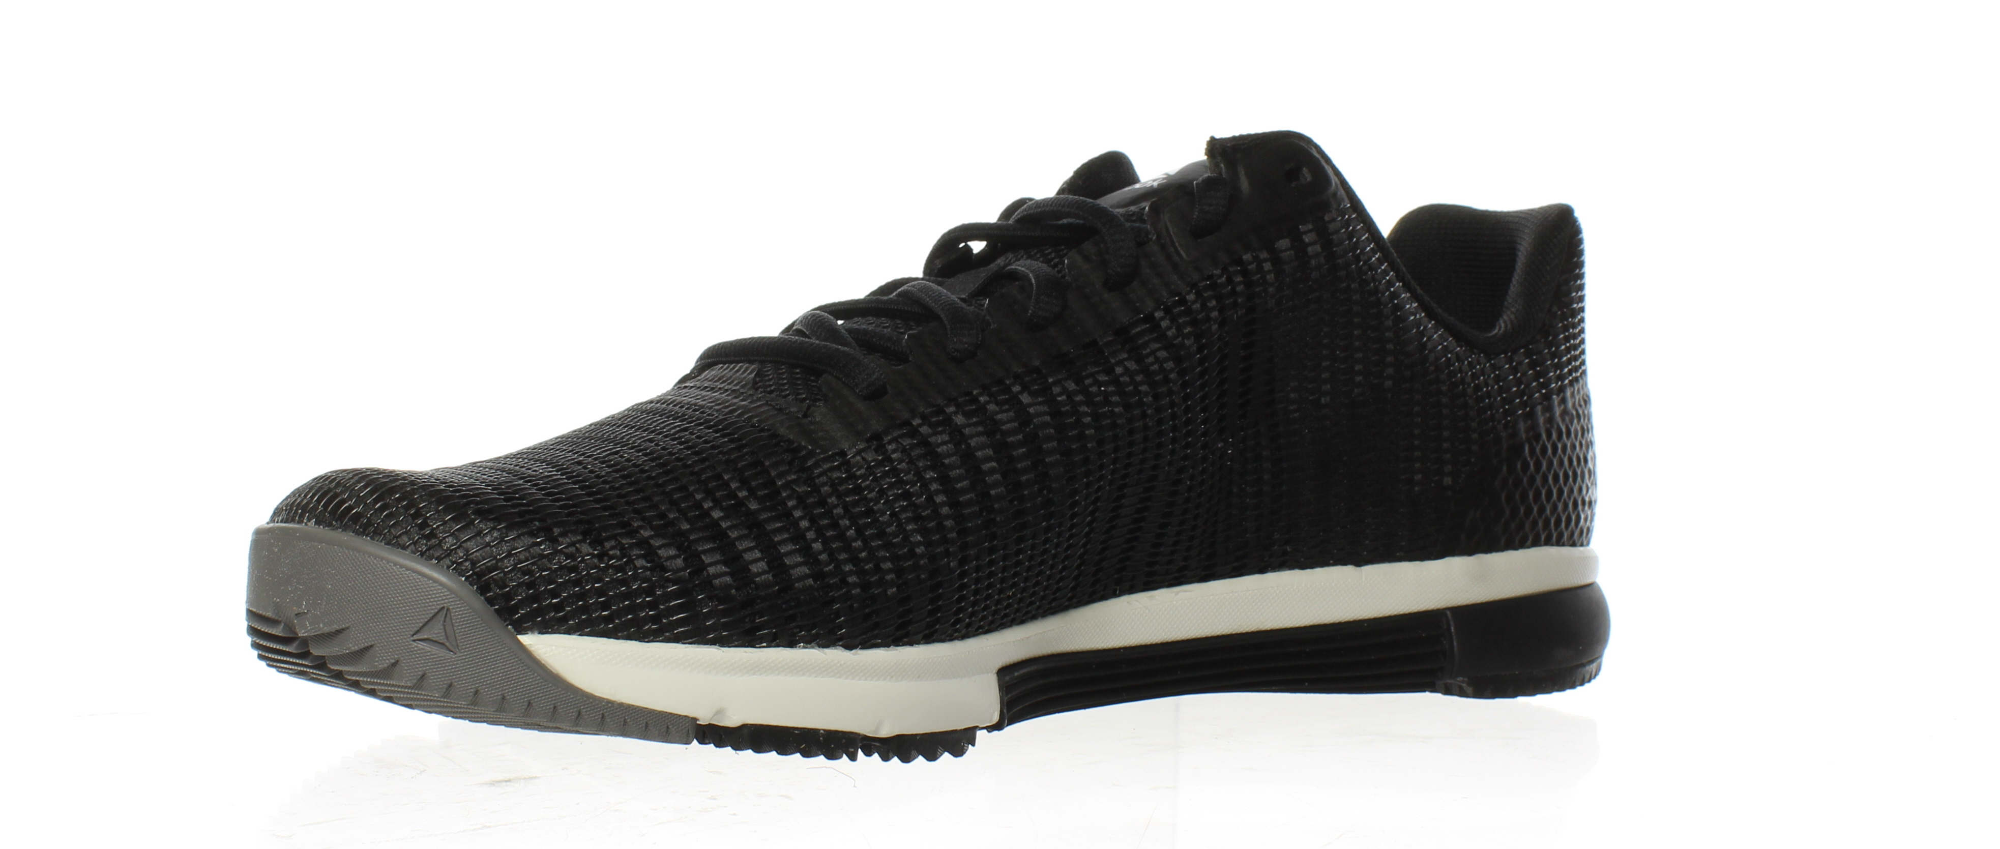 Reebok-Mens-Athletic-Speed-TR-Flexweave-Cross-Training-Shoes thumbnail 19